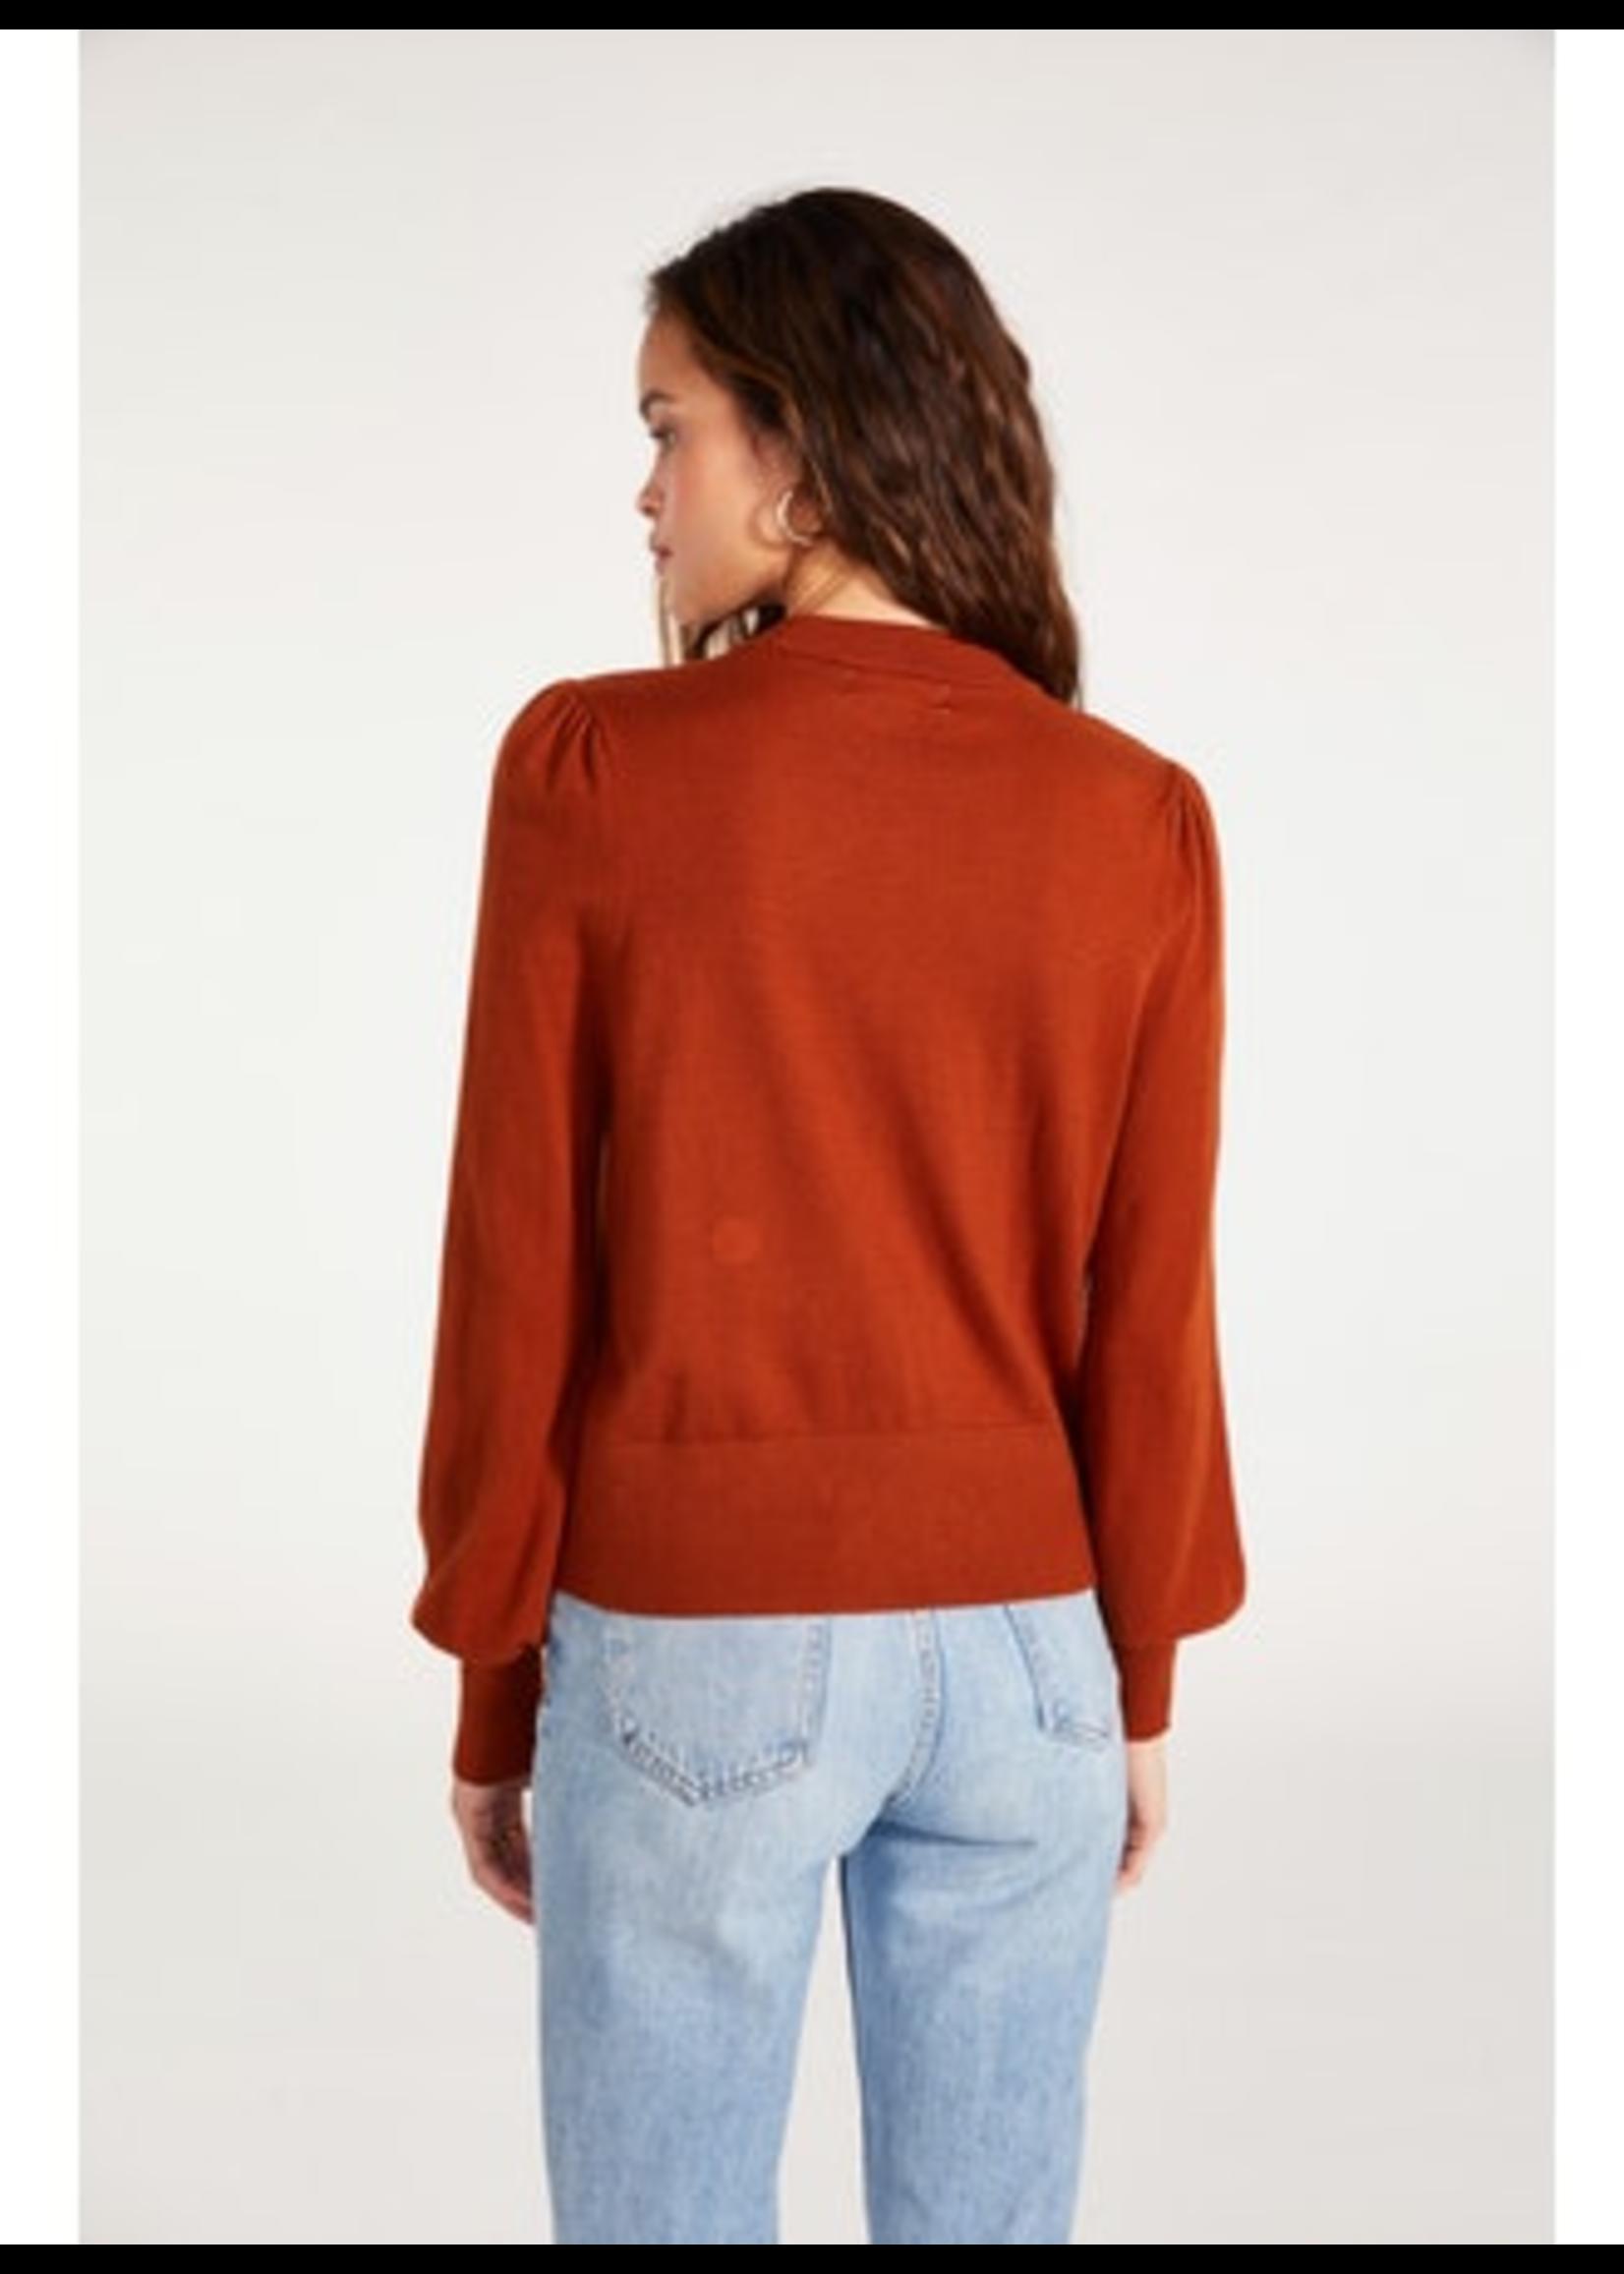 BB Dakota Respectfully Sweater